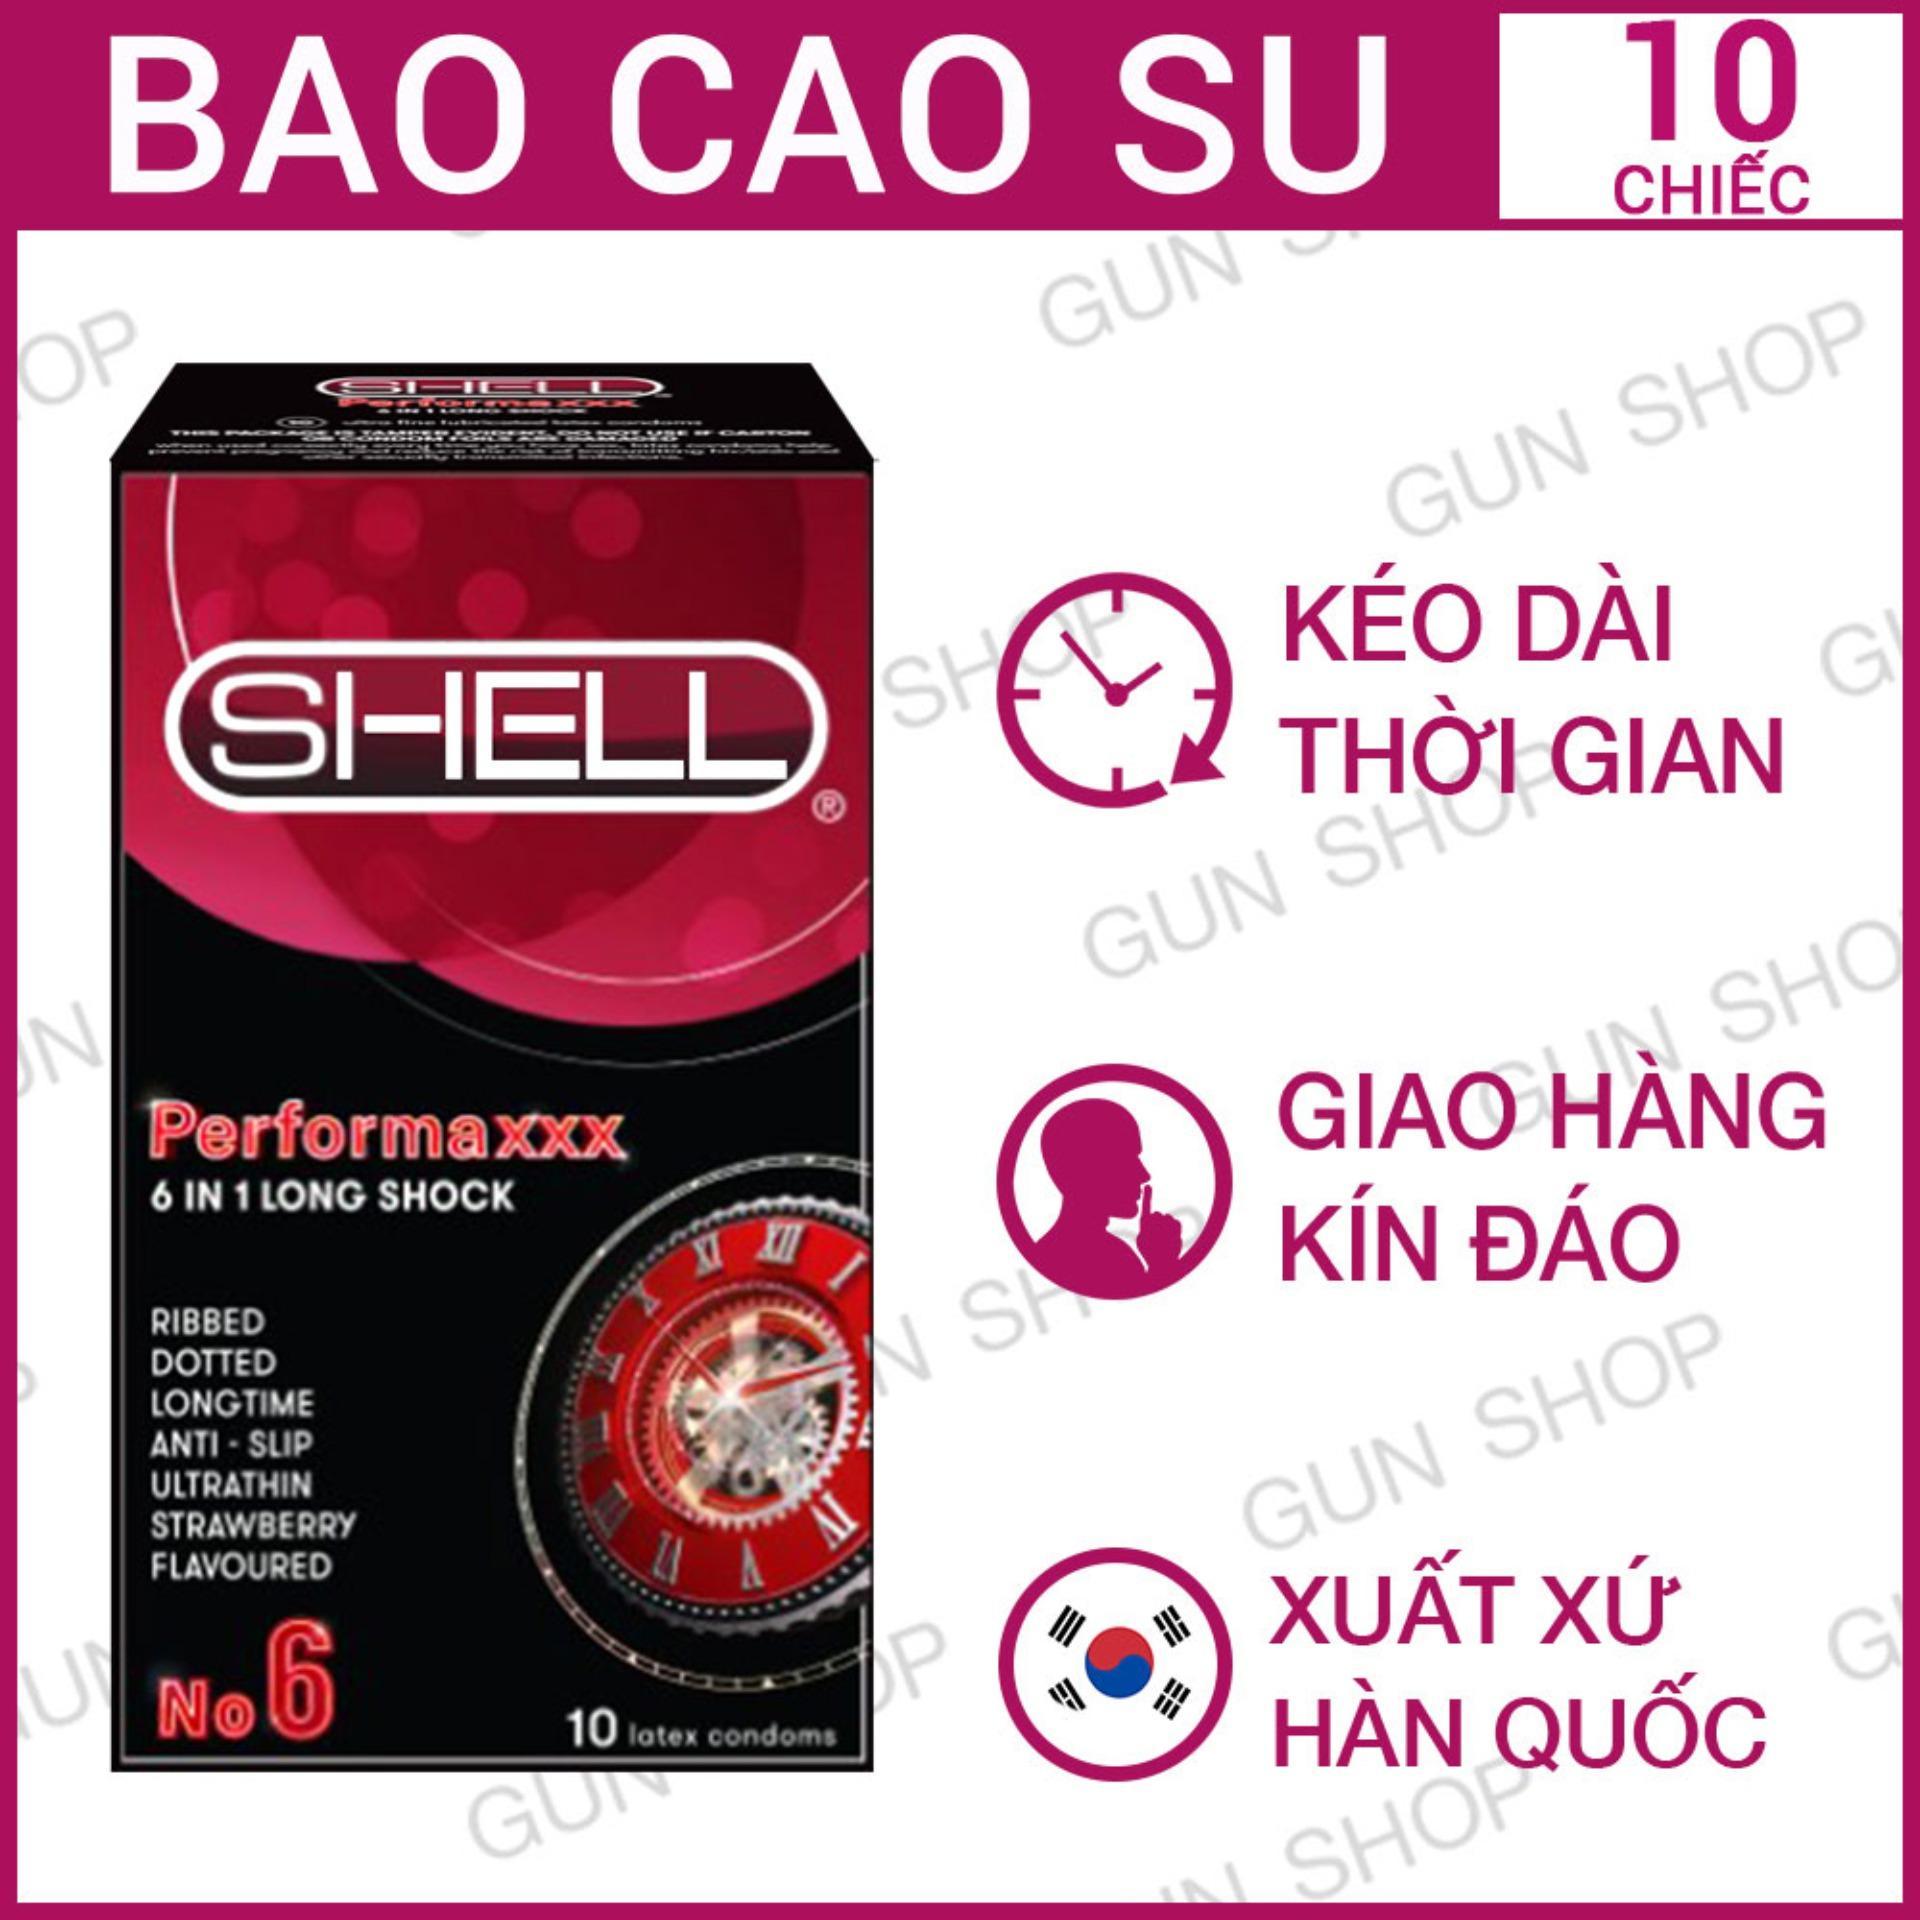 [10 Chiếc] Bao Cao Su cao cấp Hàn Quốc Shell Premium 6 In 1 - Kéo dài thời gian - Gunshop